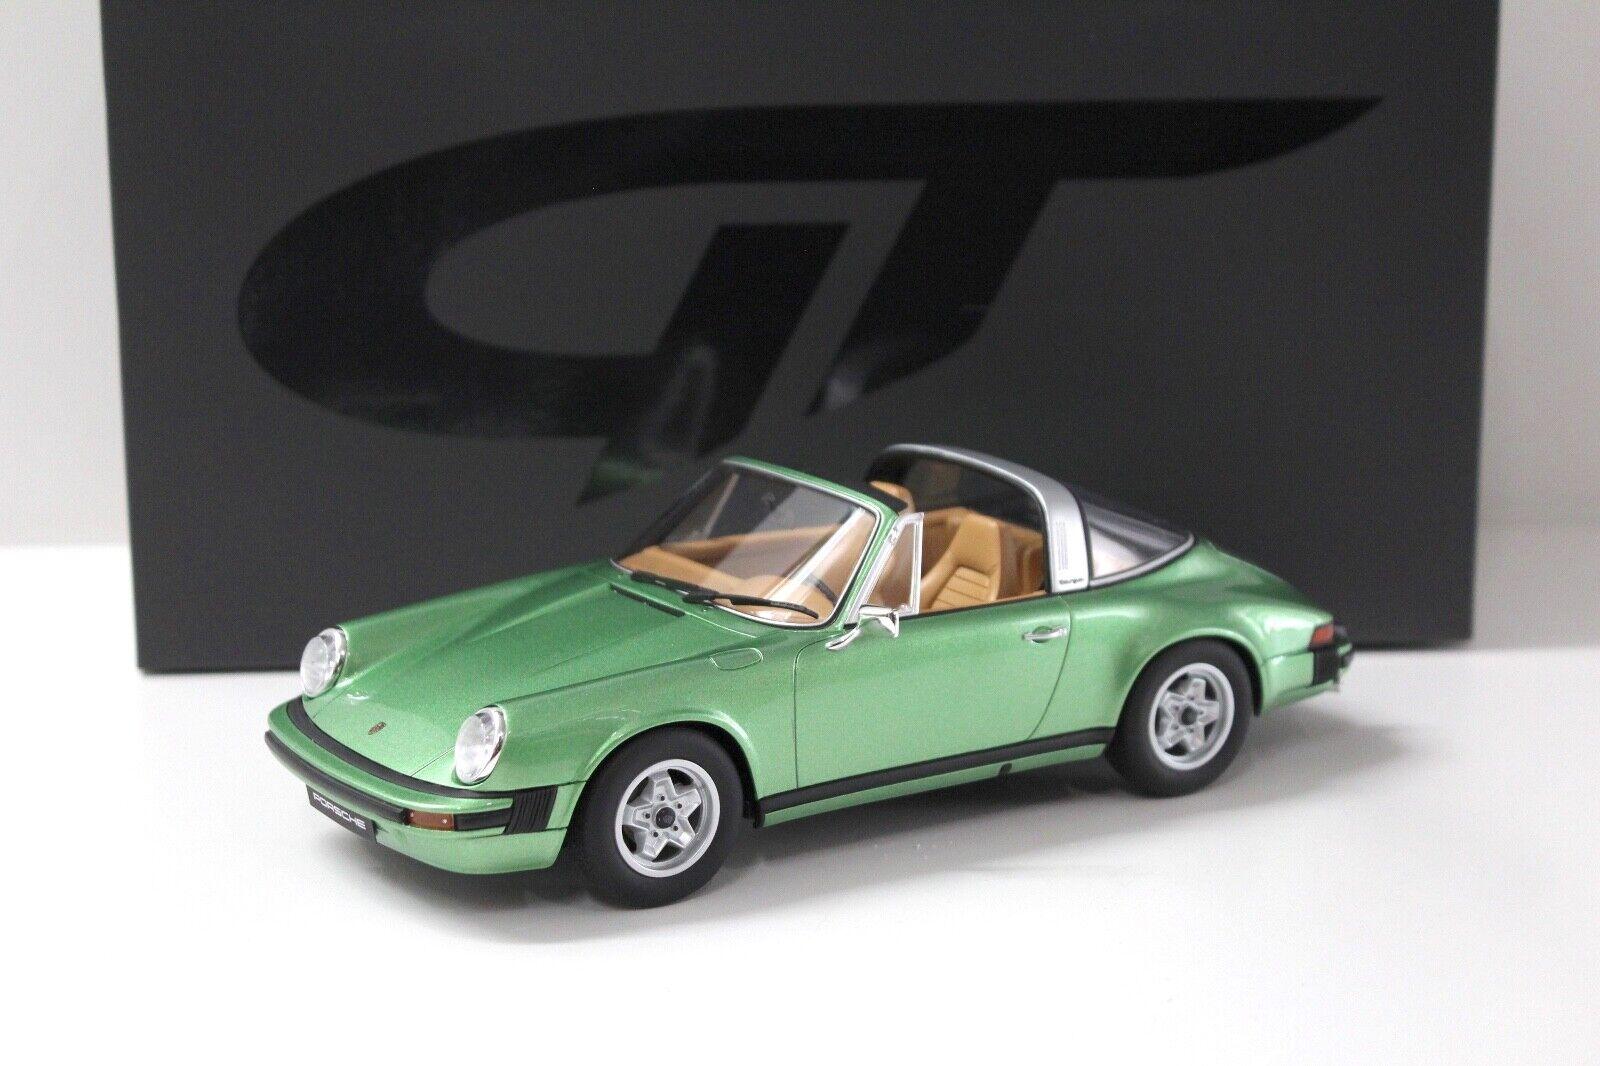 1 18 GT Spirit PORSCHE 911 2.7 TARGA 1974 ASCOT verde NEW in Premium-MODELCARS